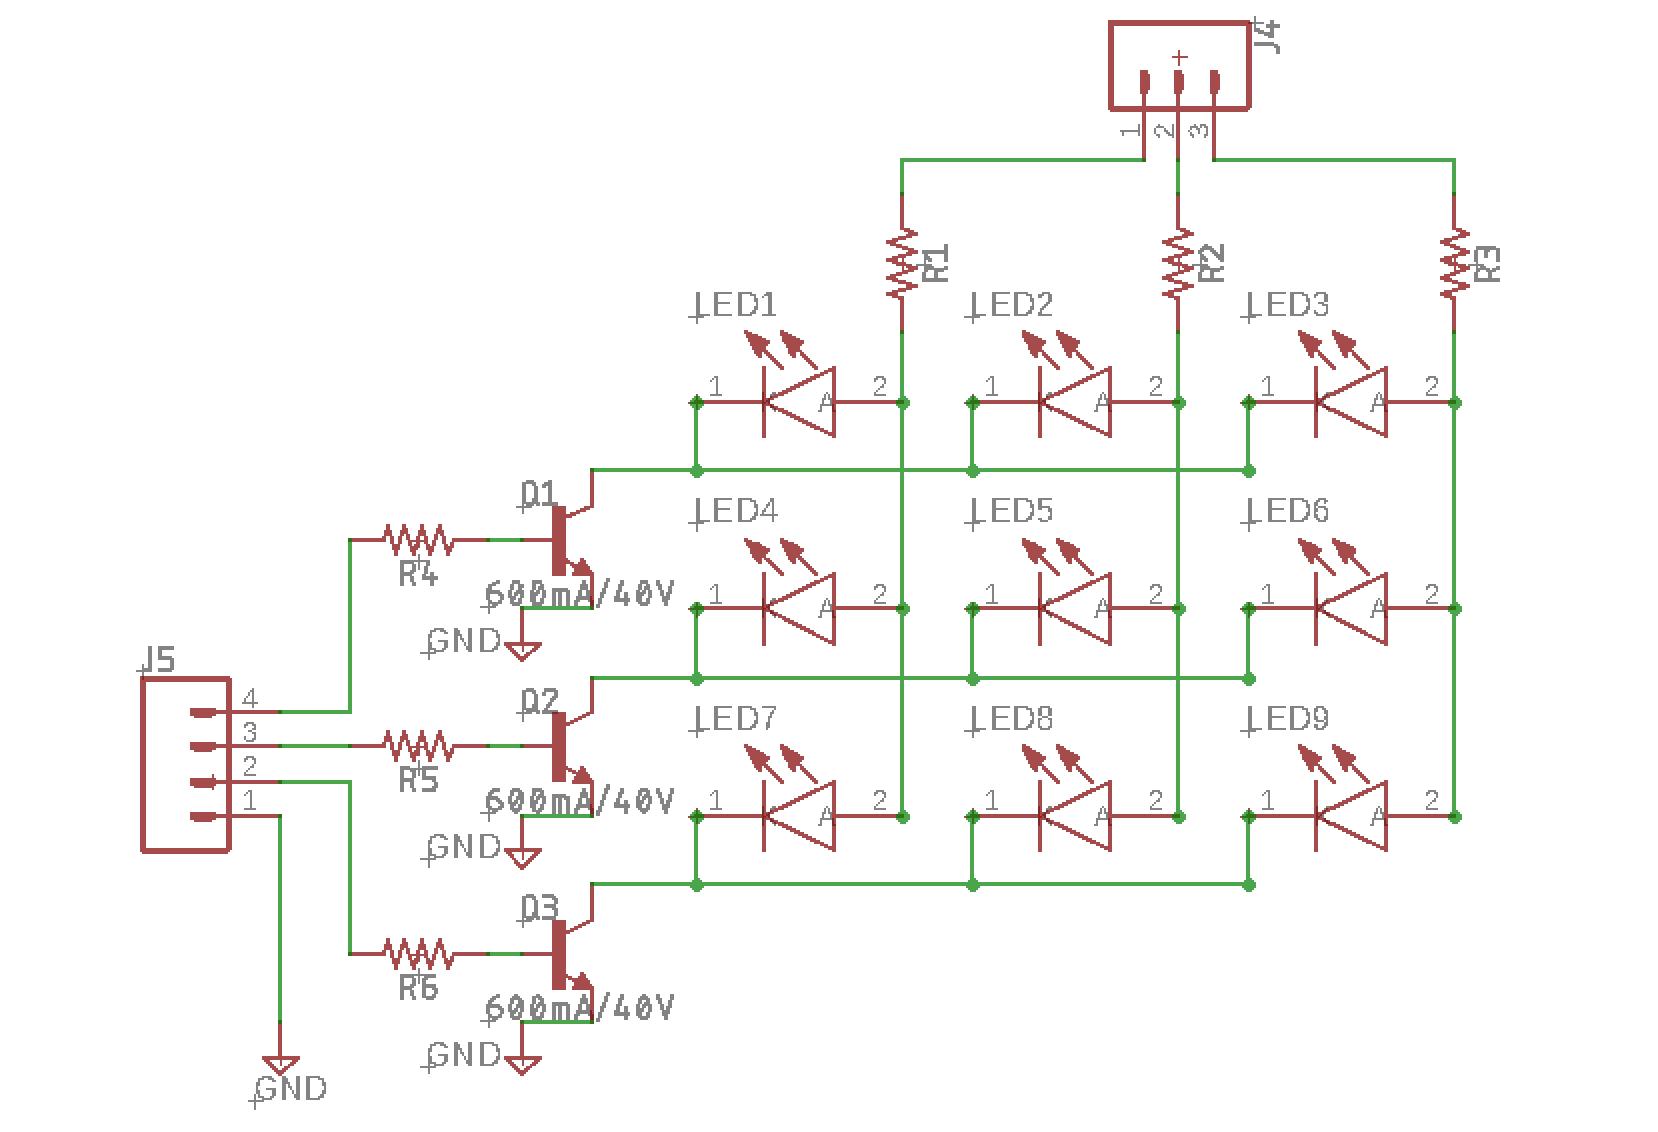 Schematic of the UVled matrix.